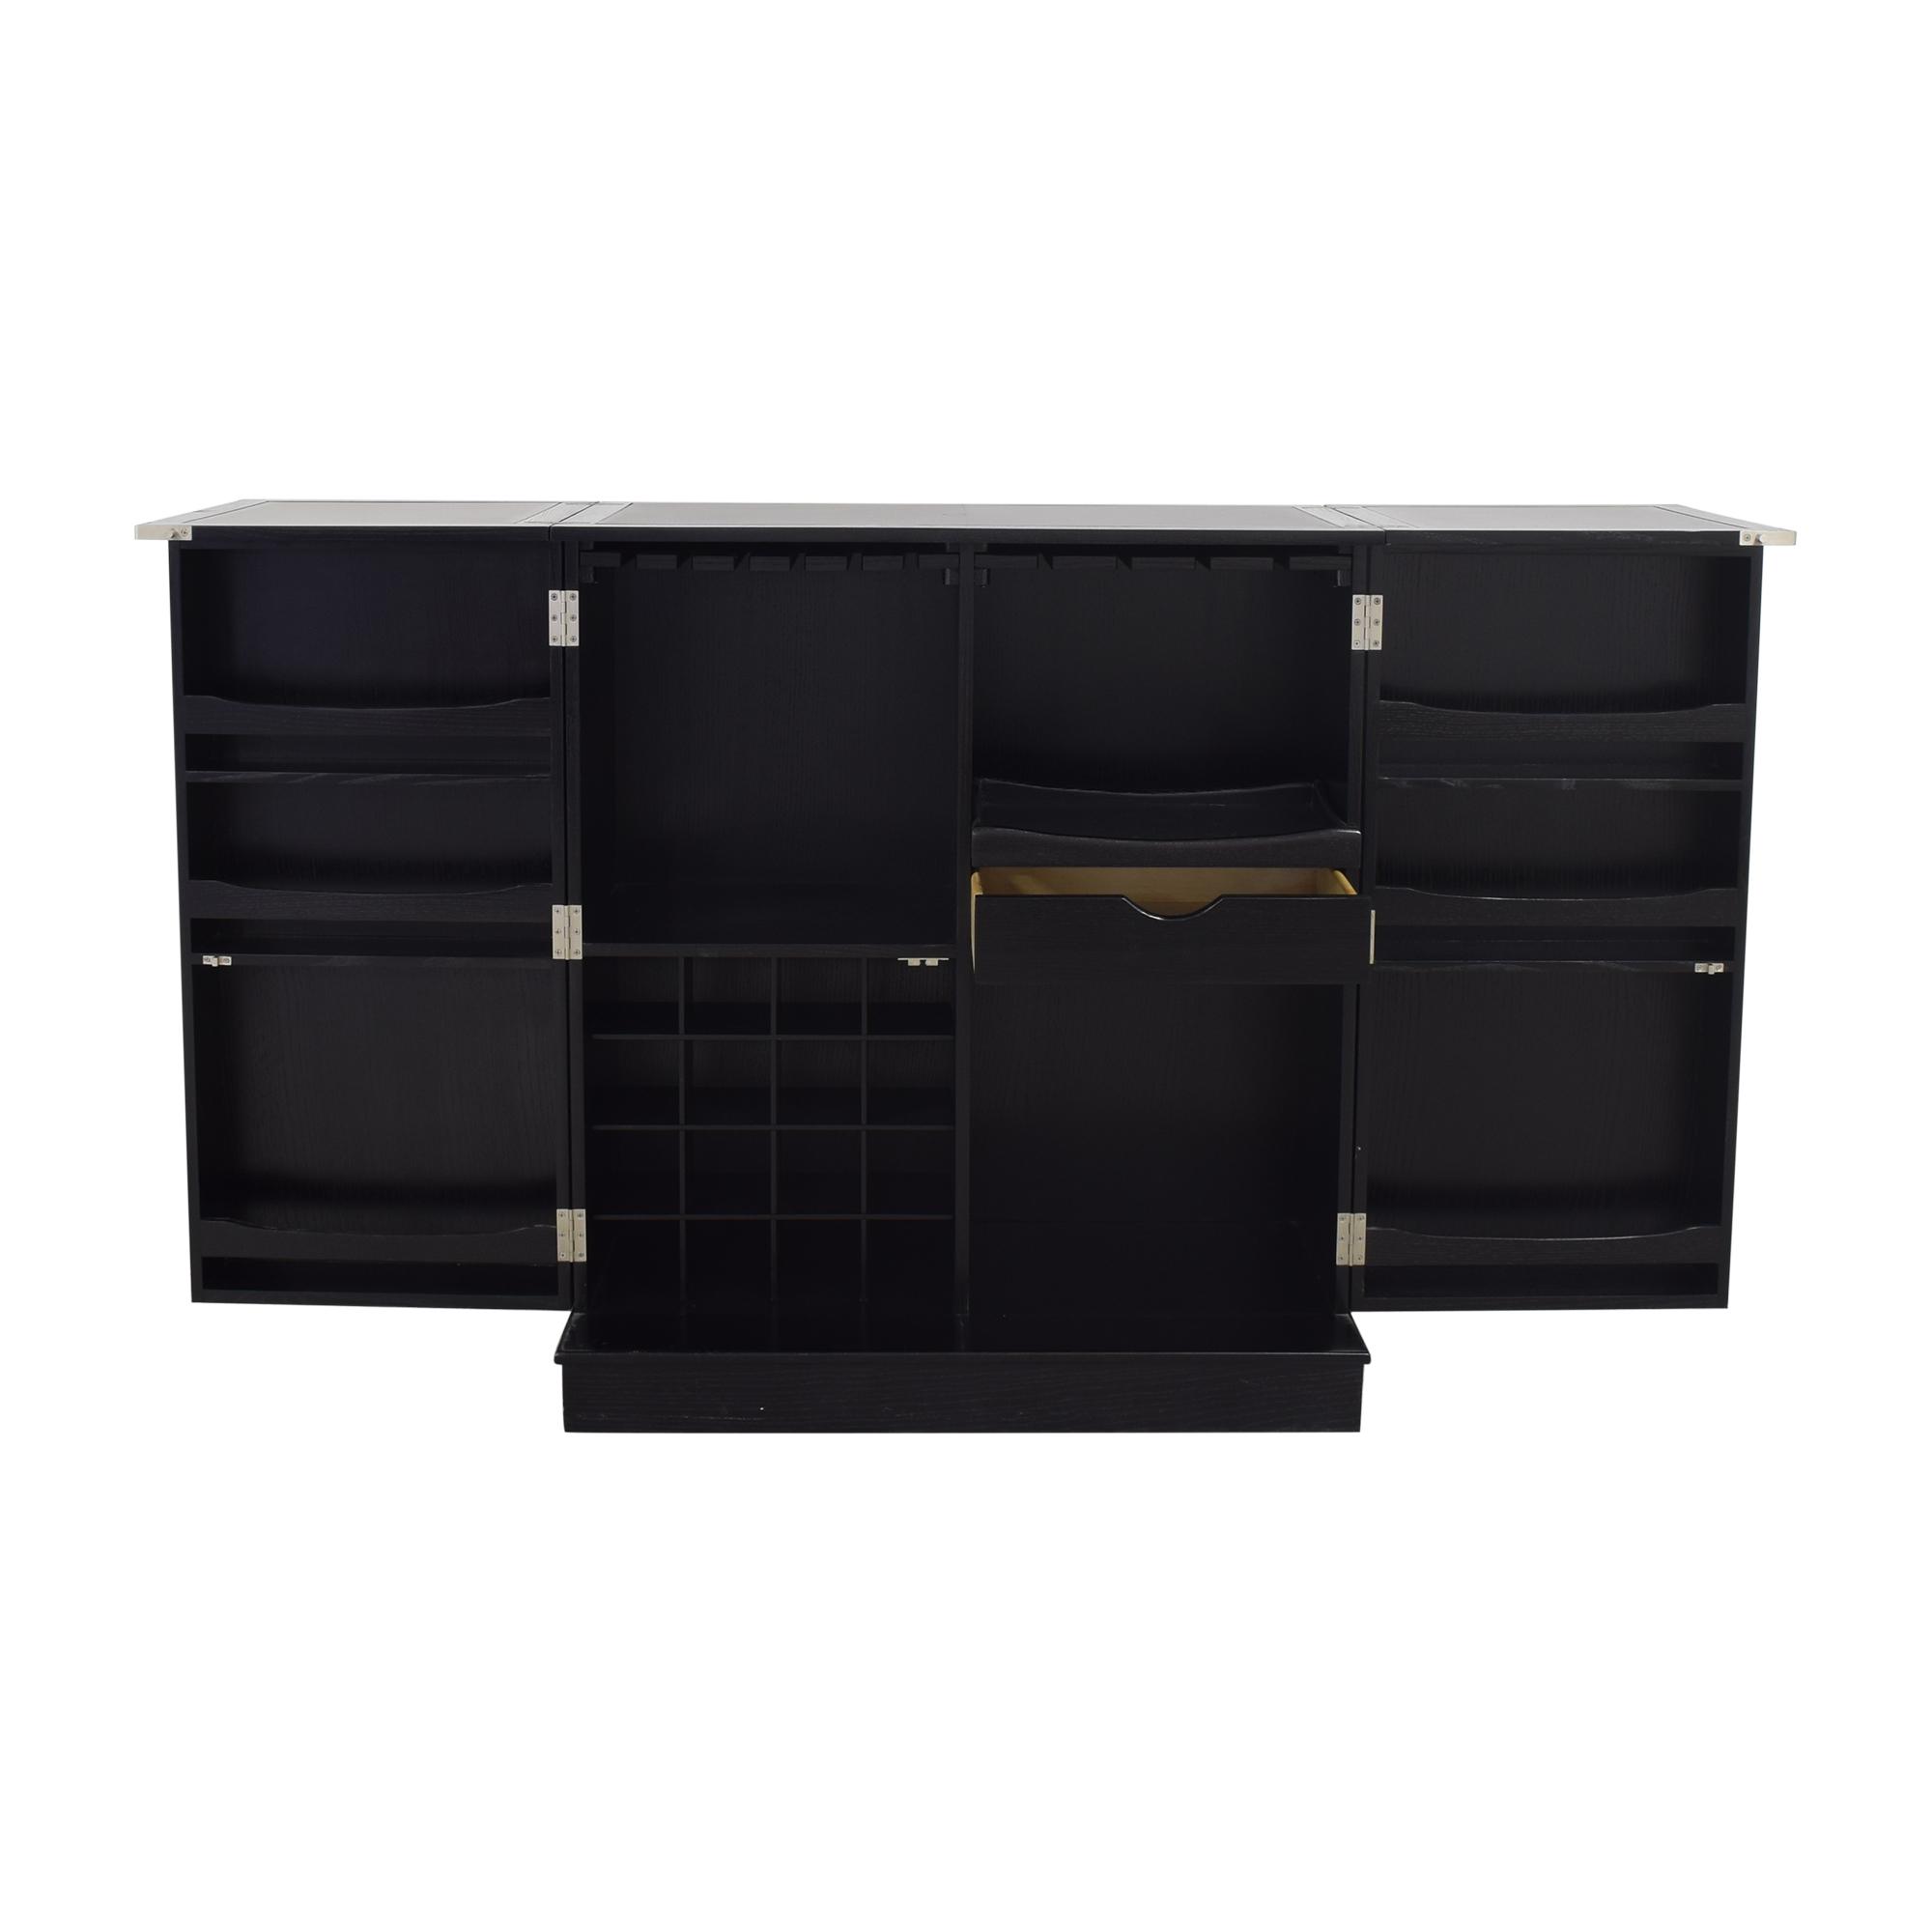 Crate & Barrel Crate & Barrel Steamer Bar Cabinet pa